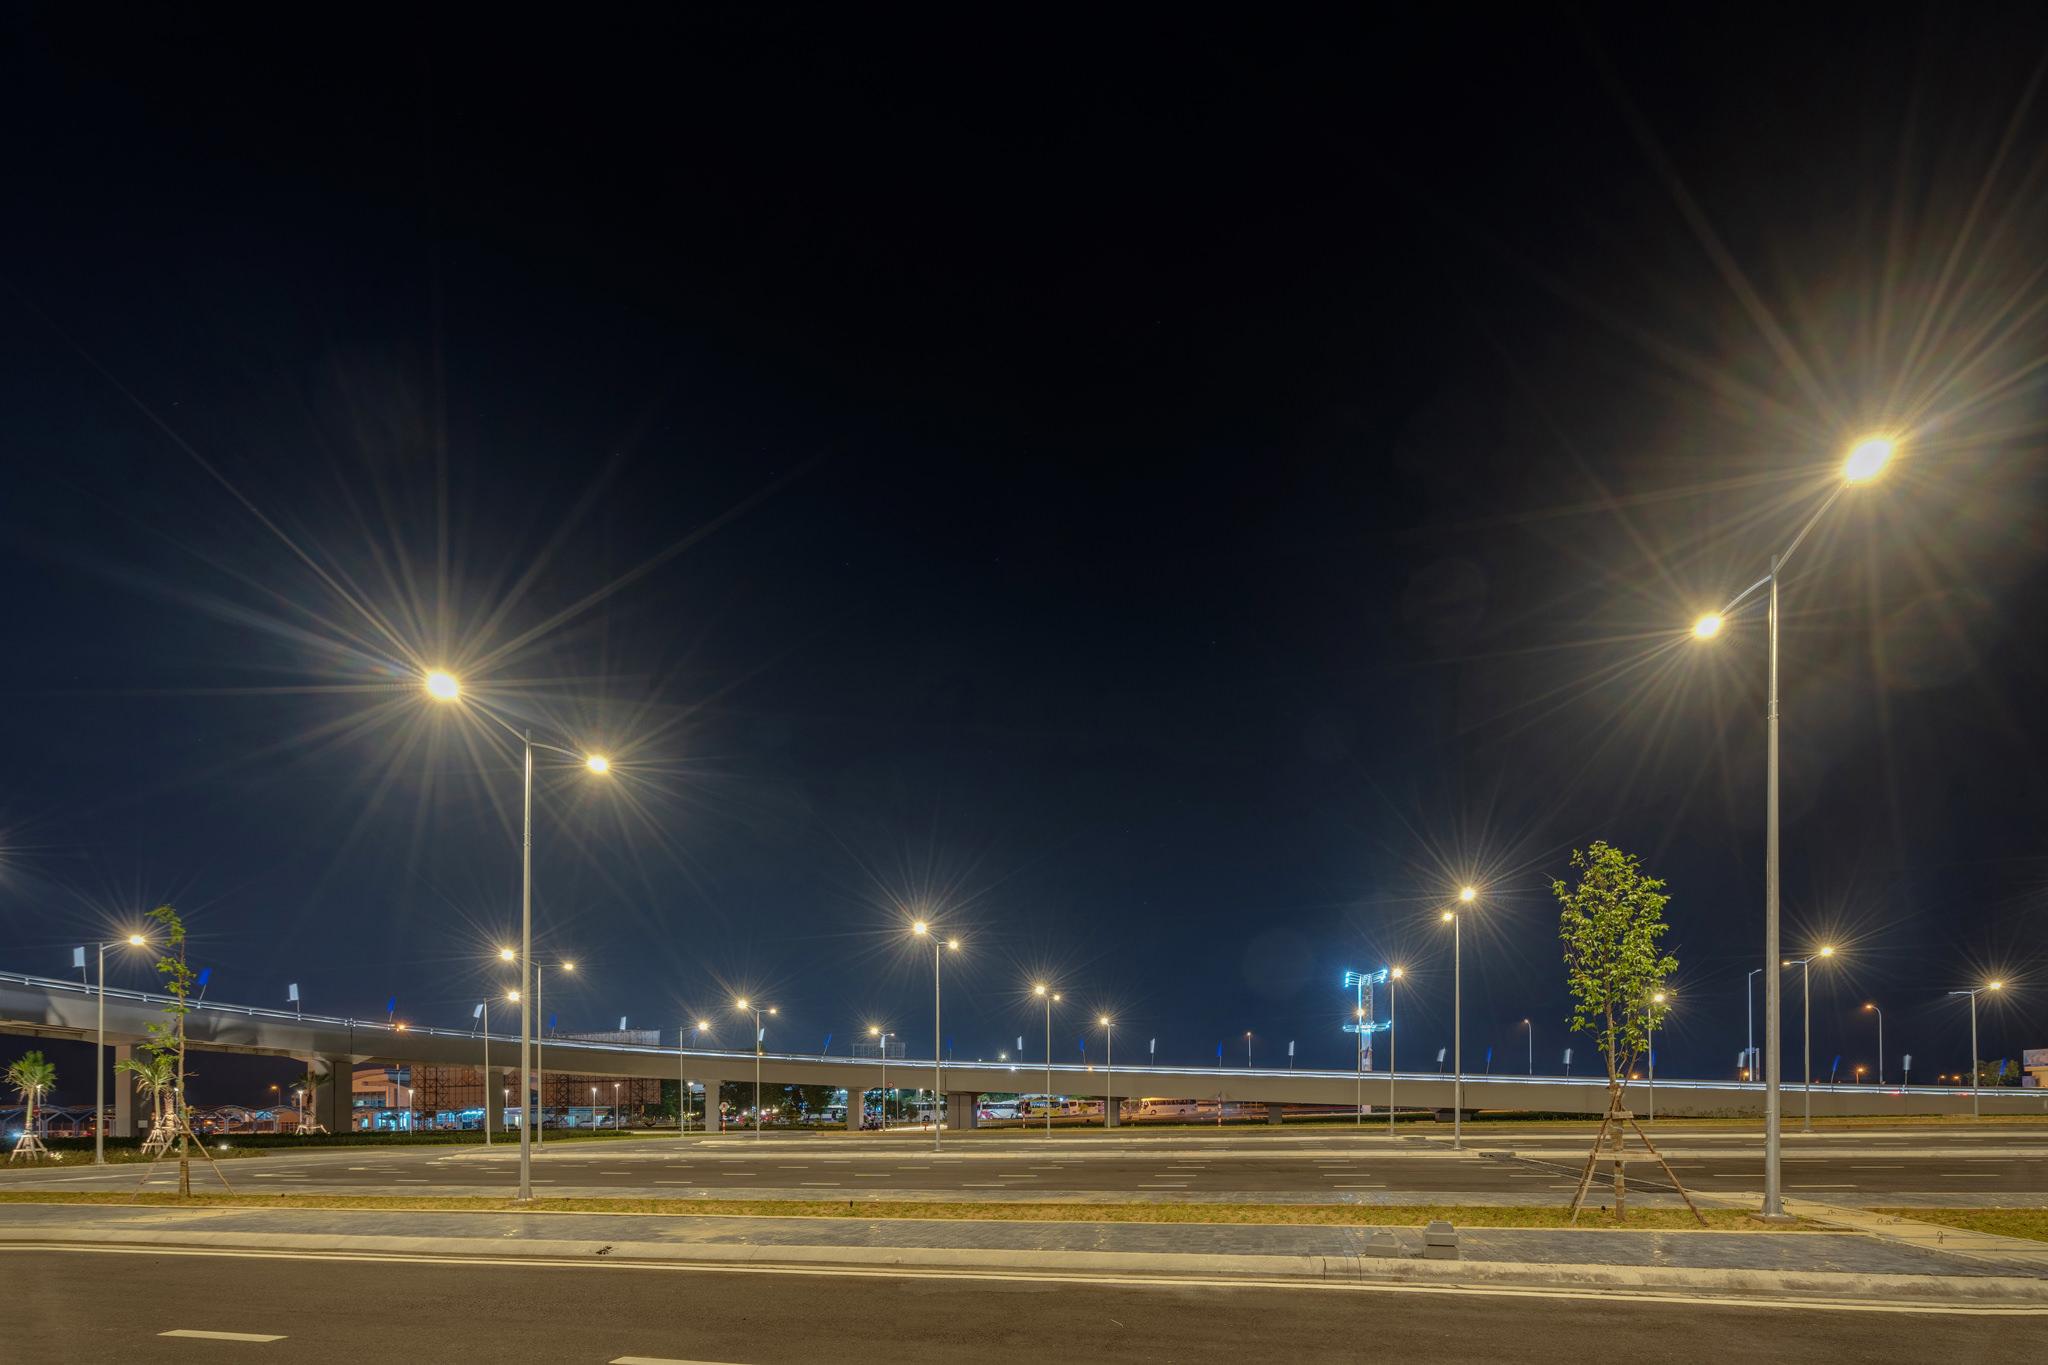 20180626 - Cam Ranh Airport - Architecture - 0400.jpg